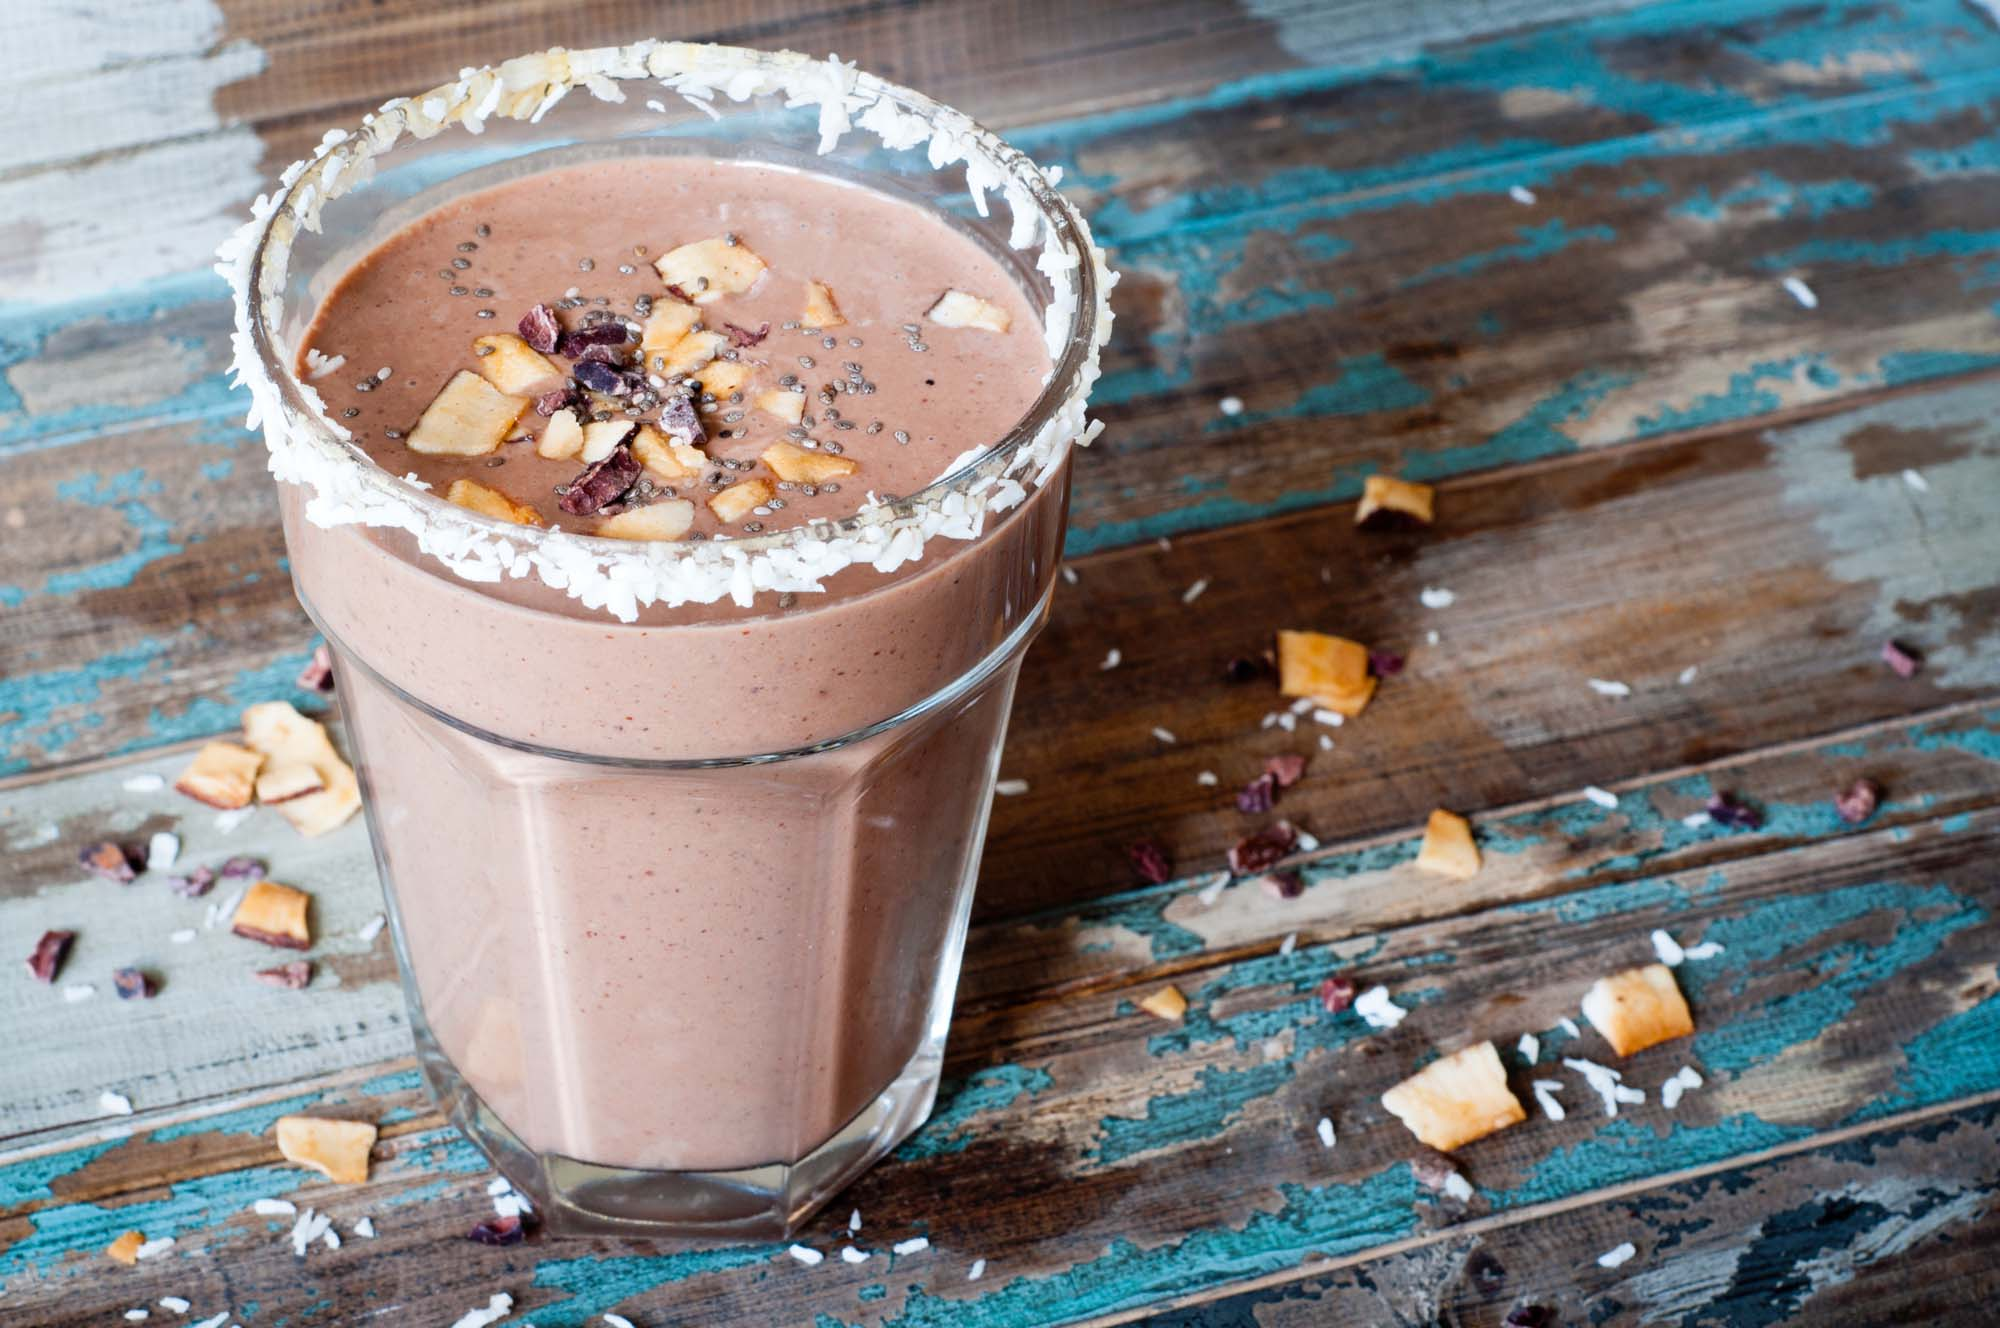 Chokolade shake med protein